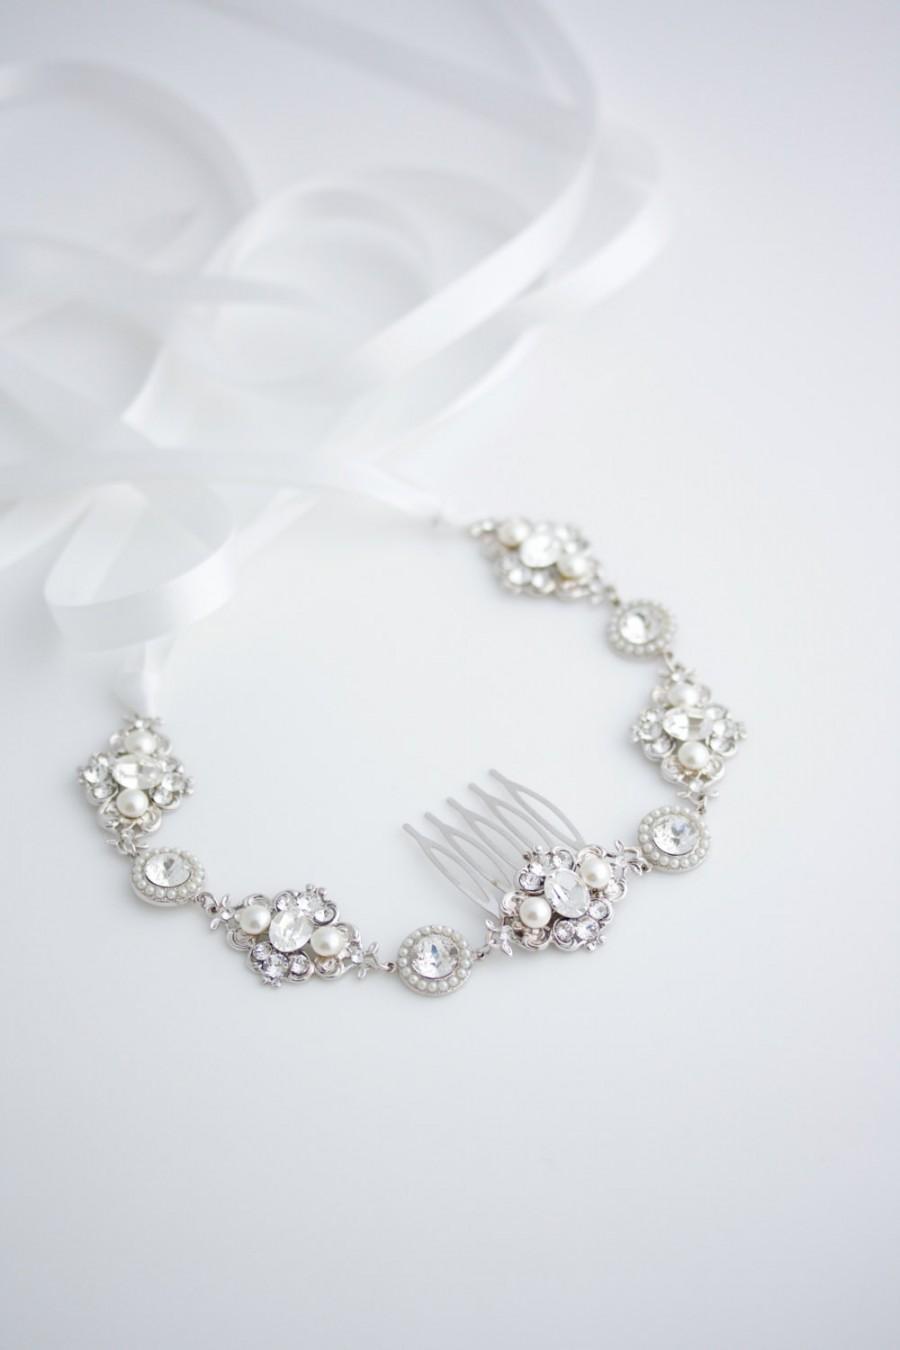 Mariage - Wedding Headband Wedding Hair Accessories Ribbon Headband Pearl Crystal  White Pearl Ivory Pearl Headband Bridal headband LEILA RIBBON